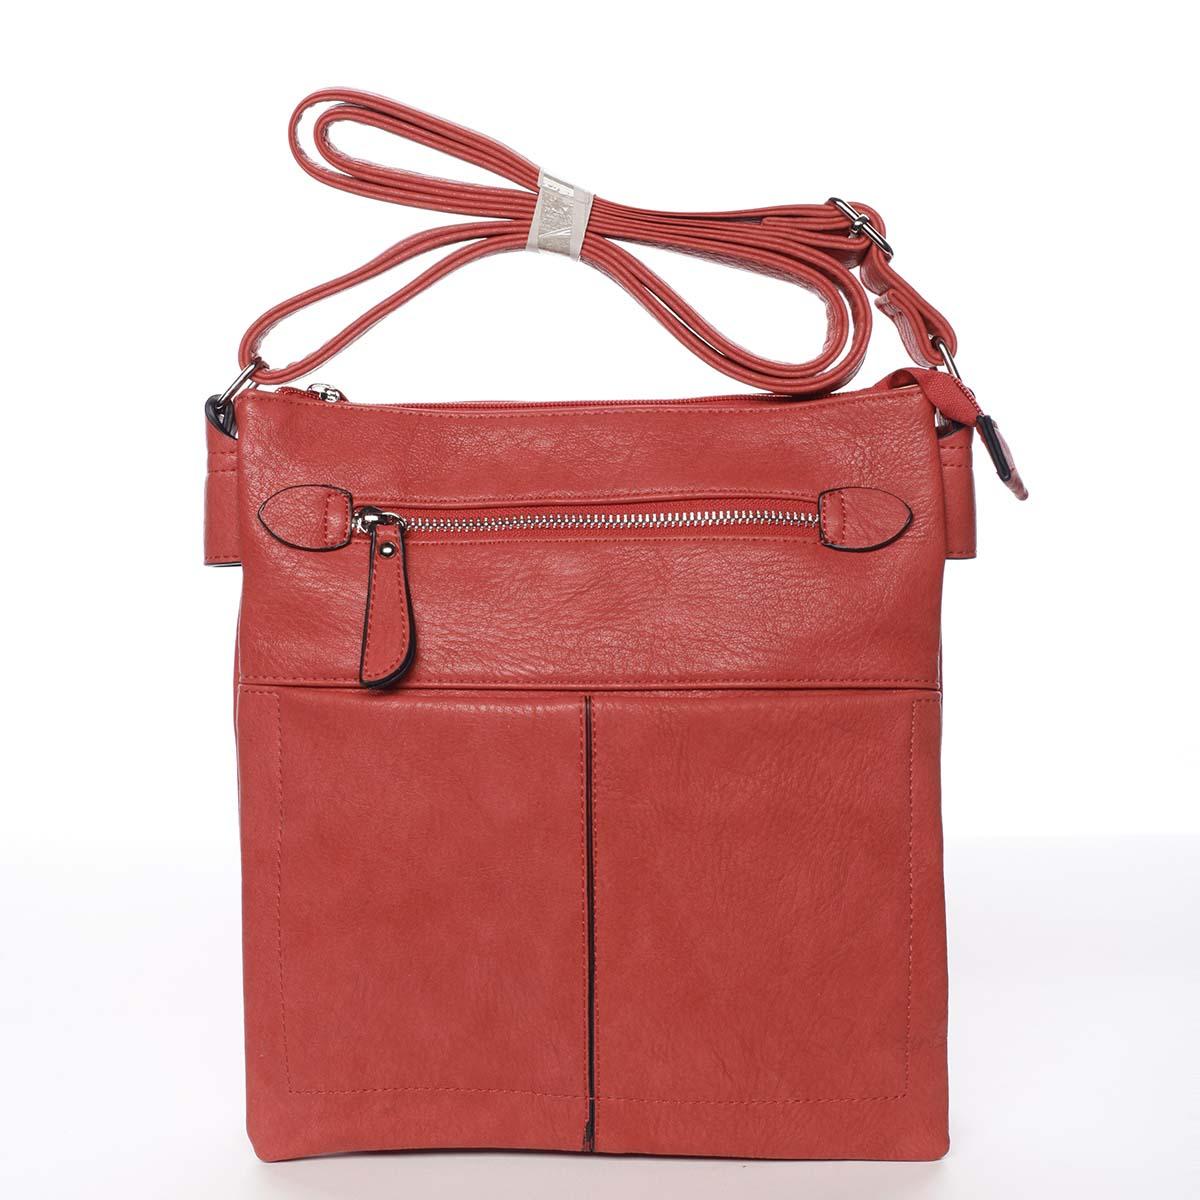 Dámska červená moderná a elegantná crossbody kabelka - Dudlin Ketty